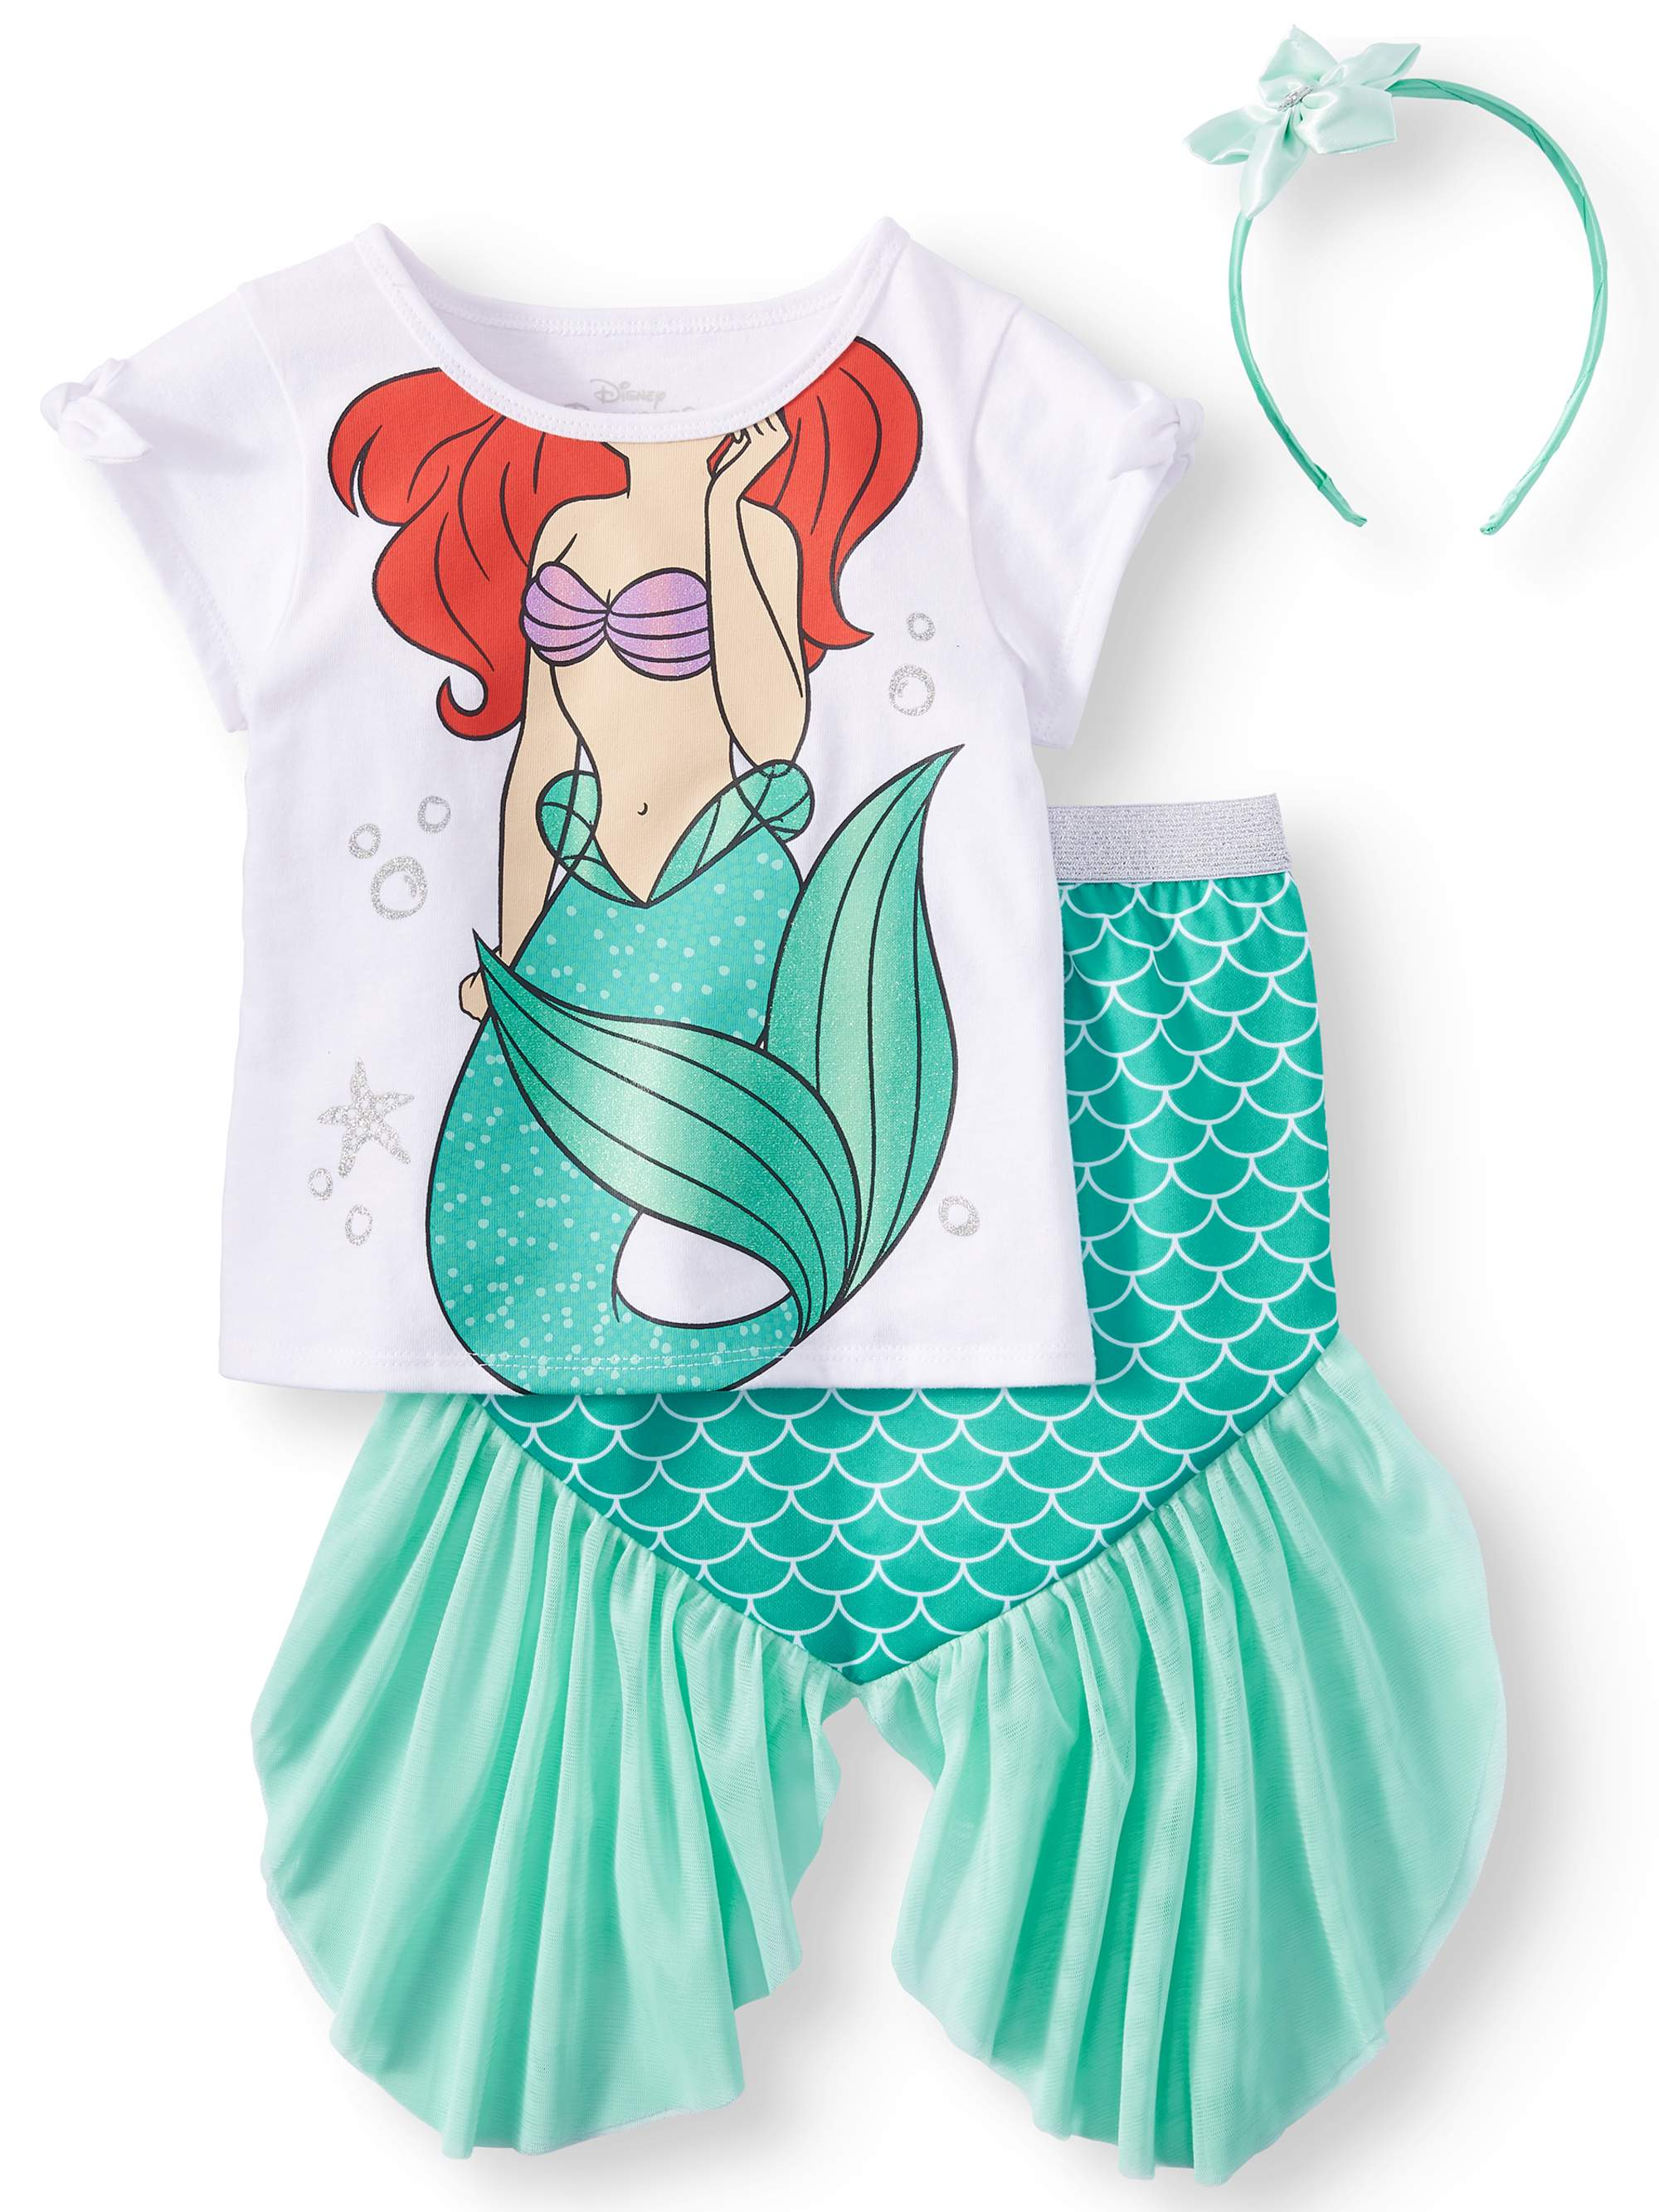 b50928ad5f18a The Little Mermaid T-Shirt, Tutu Skirt, & Headband, 3pc Outfit Set ...